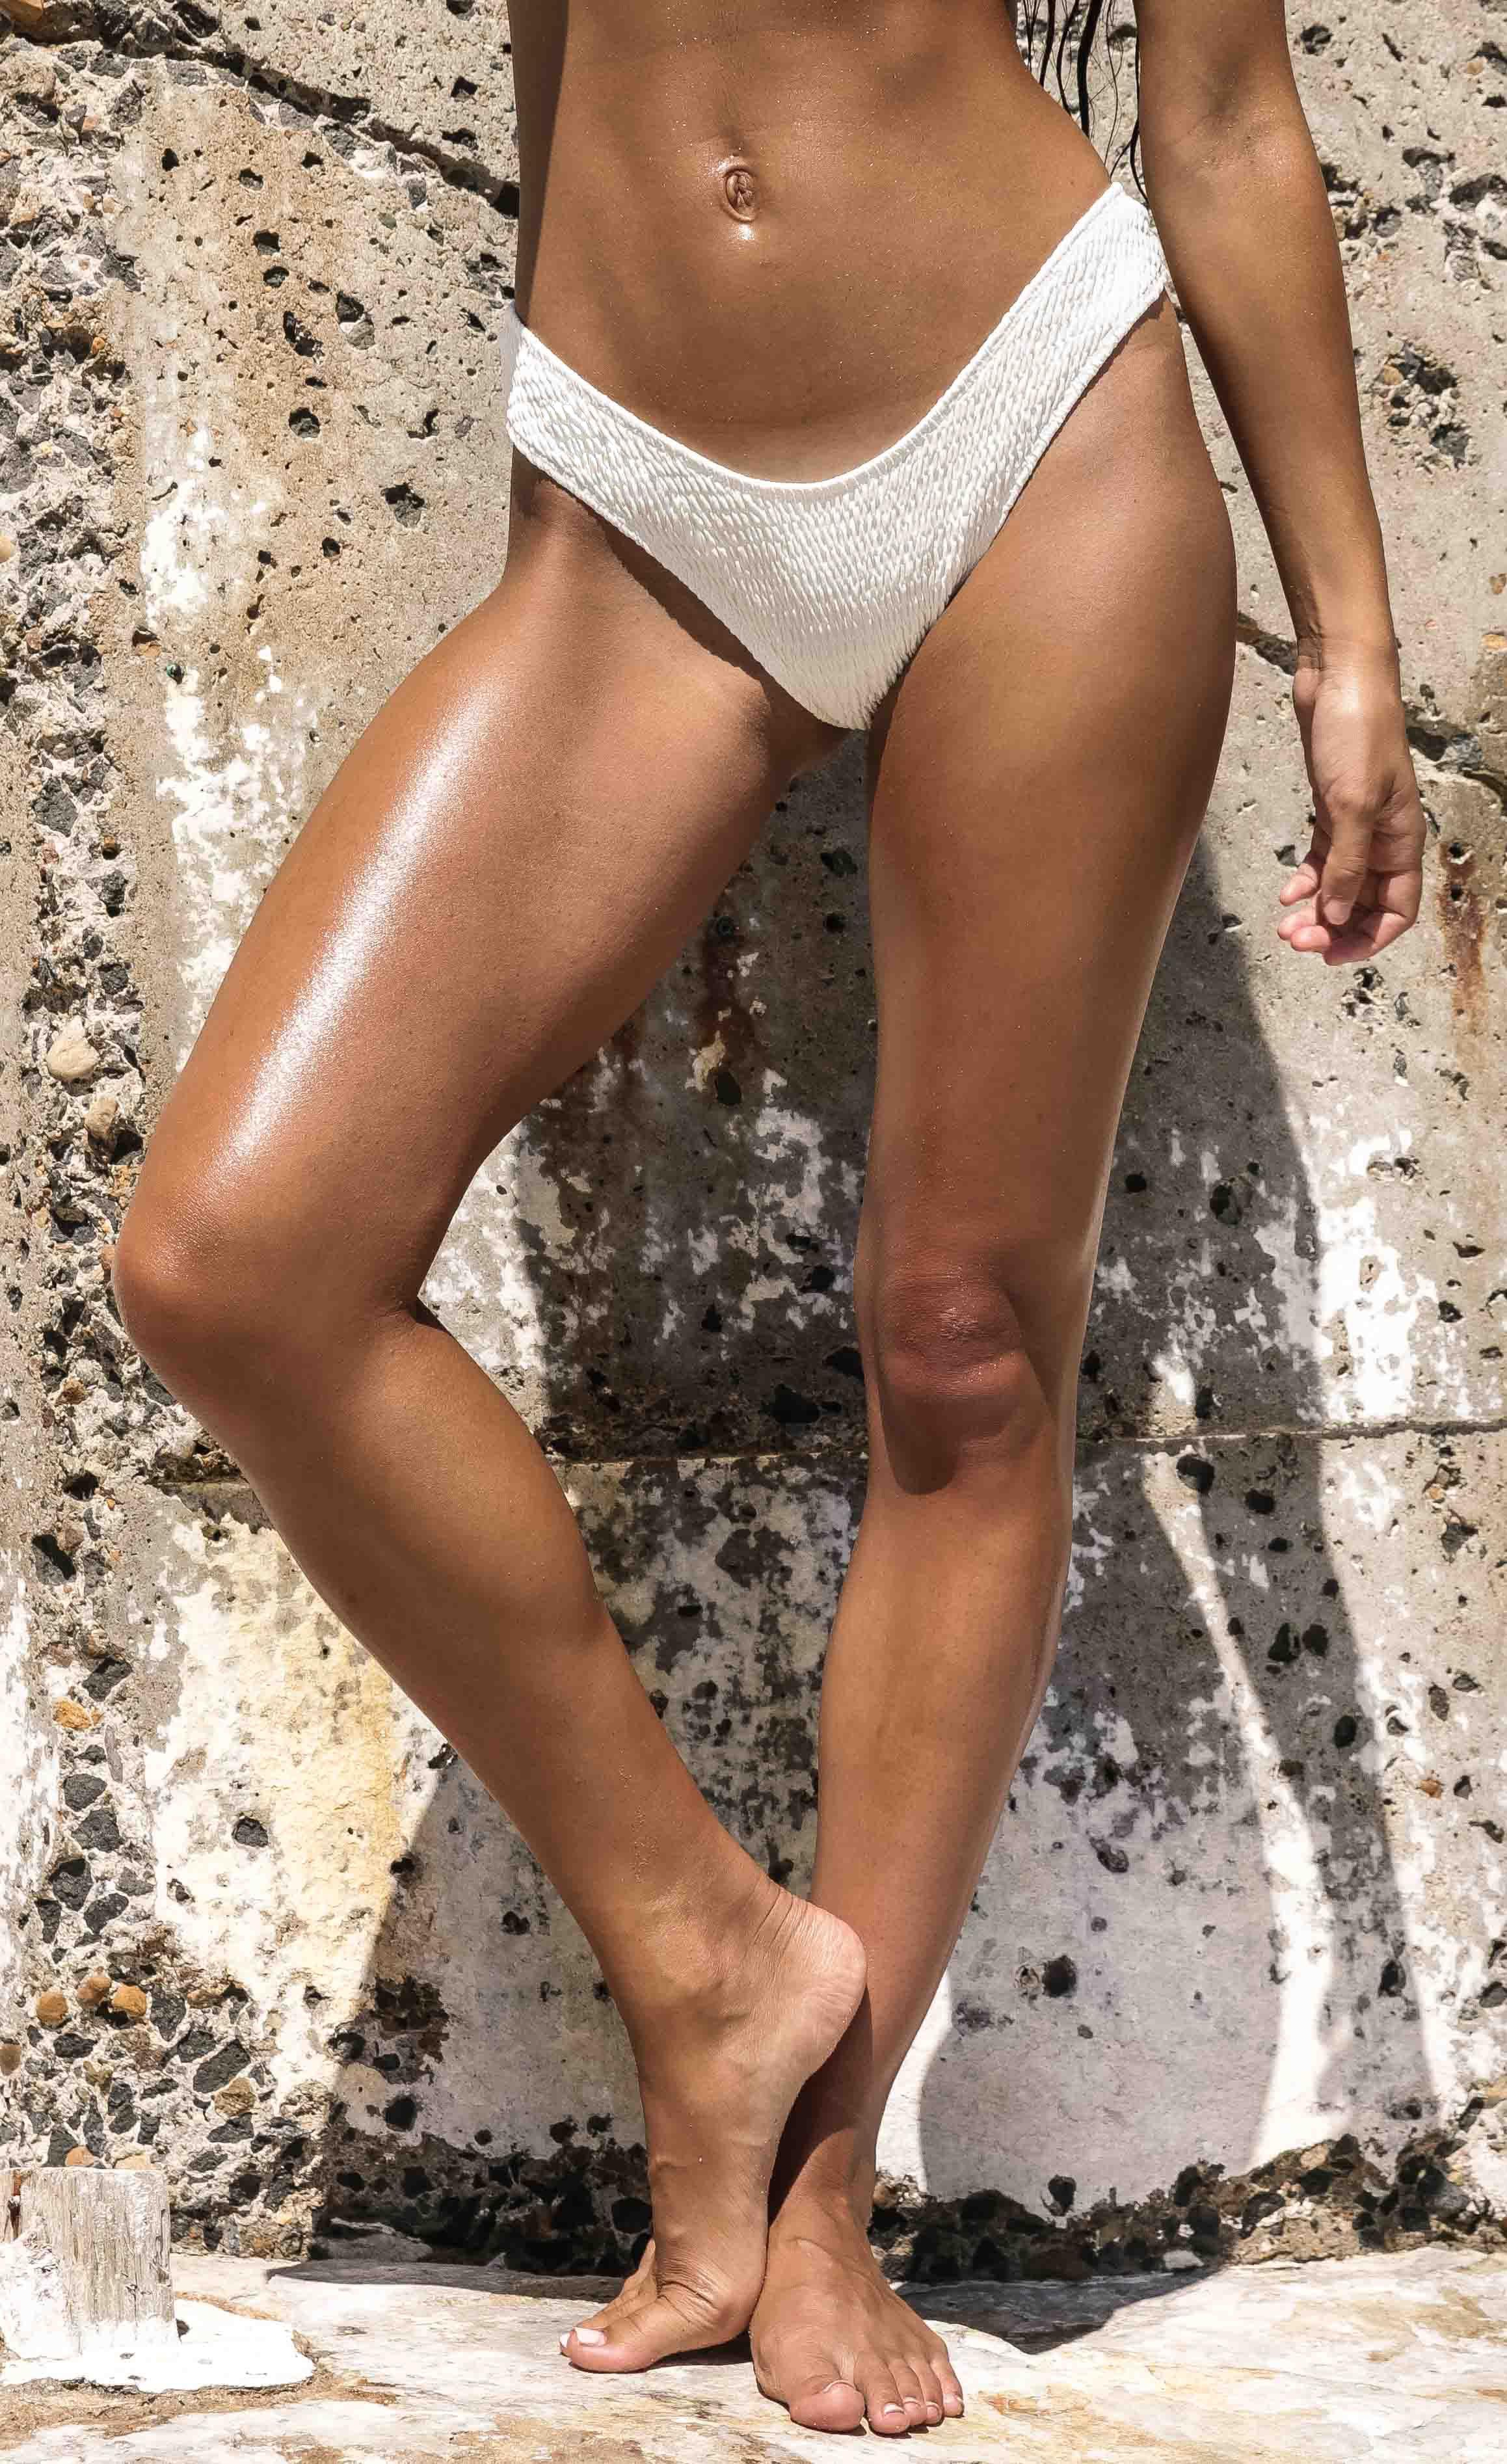 Snapchat Sonja Van Heerden naked (67 photos), Sexy, Hot, Boobs, legs 2017